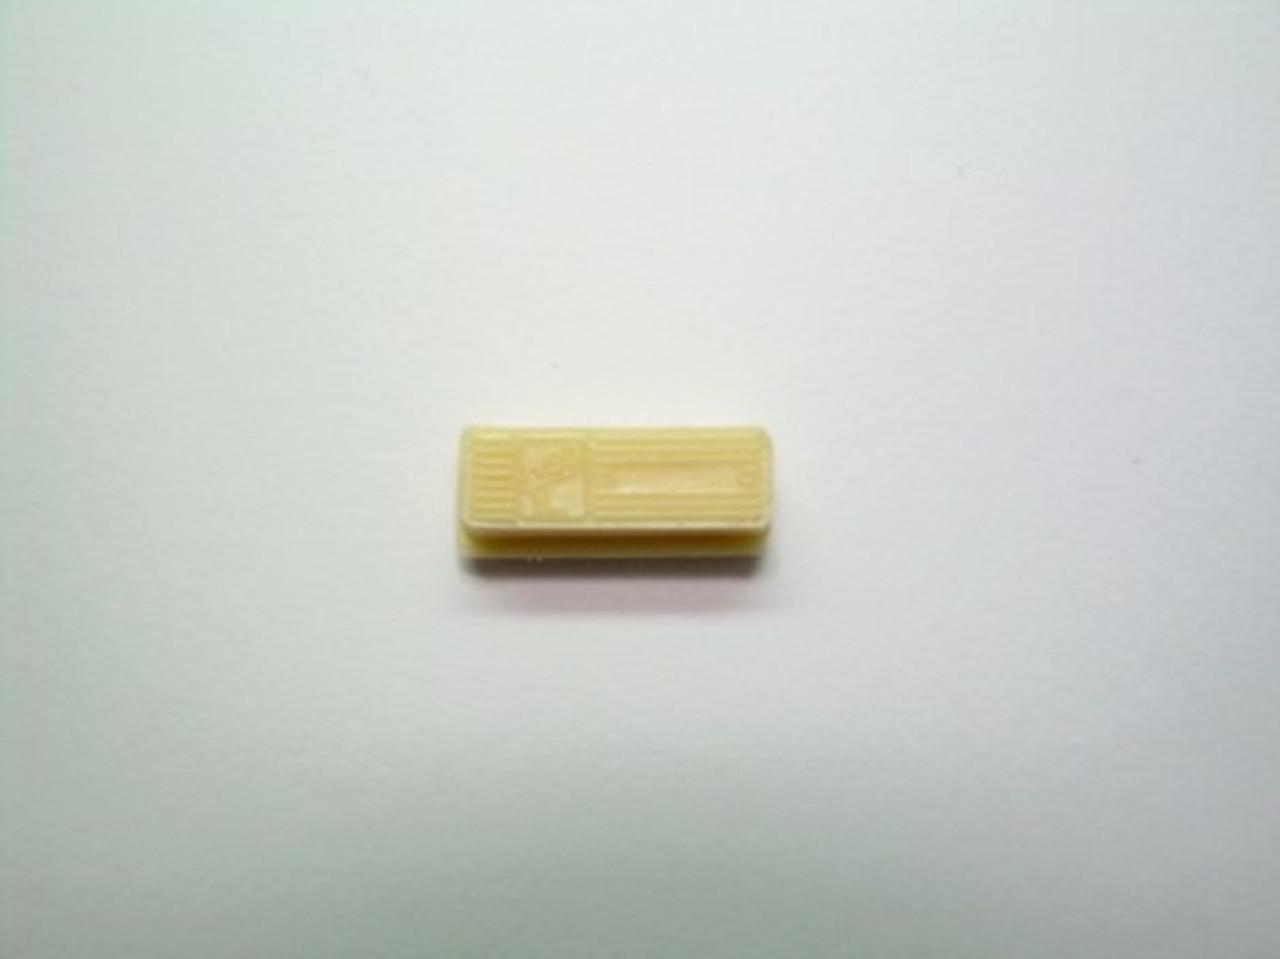 MSD 6 Ignition Box 1/25